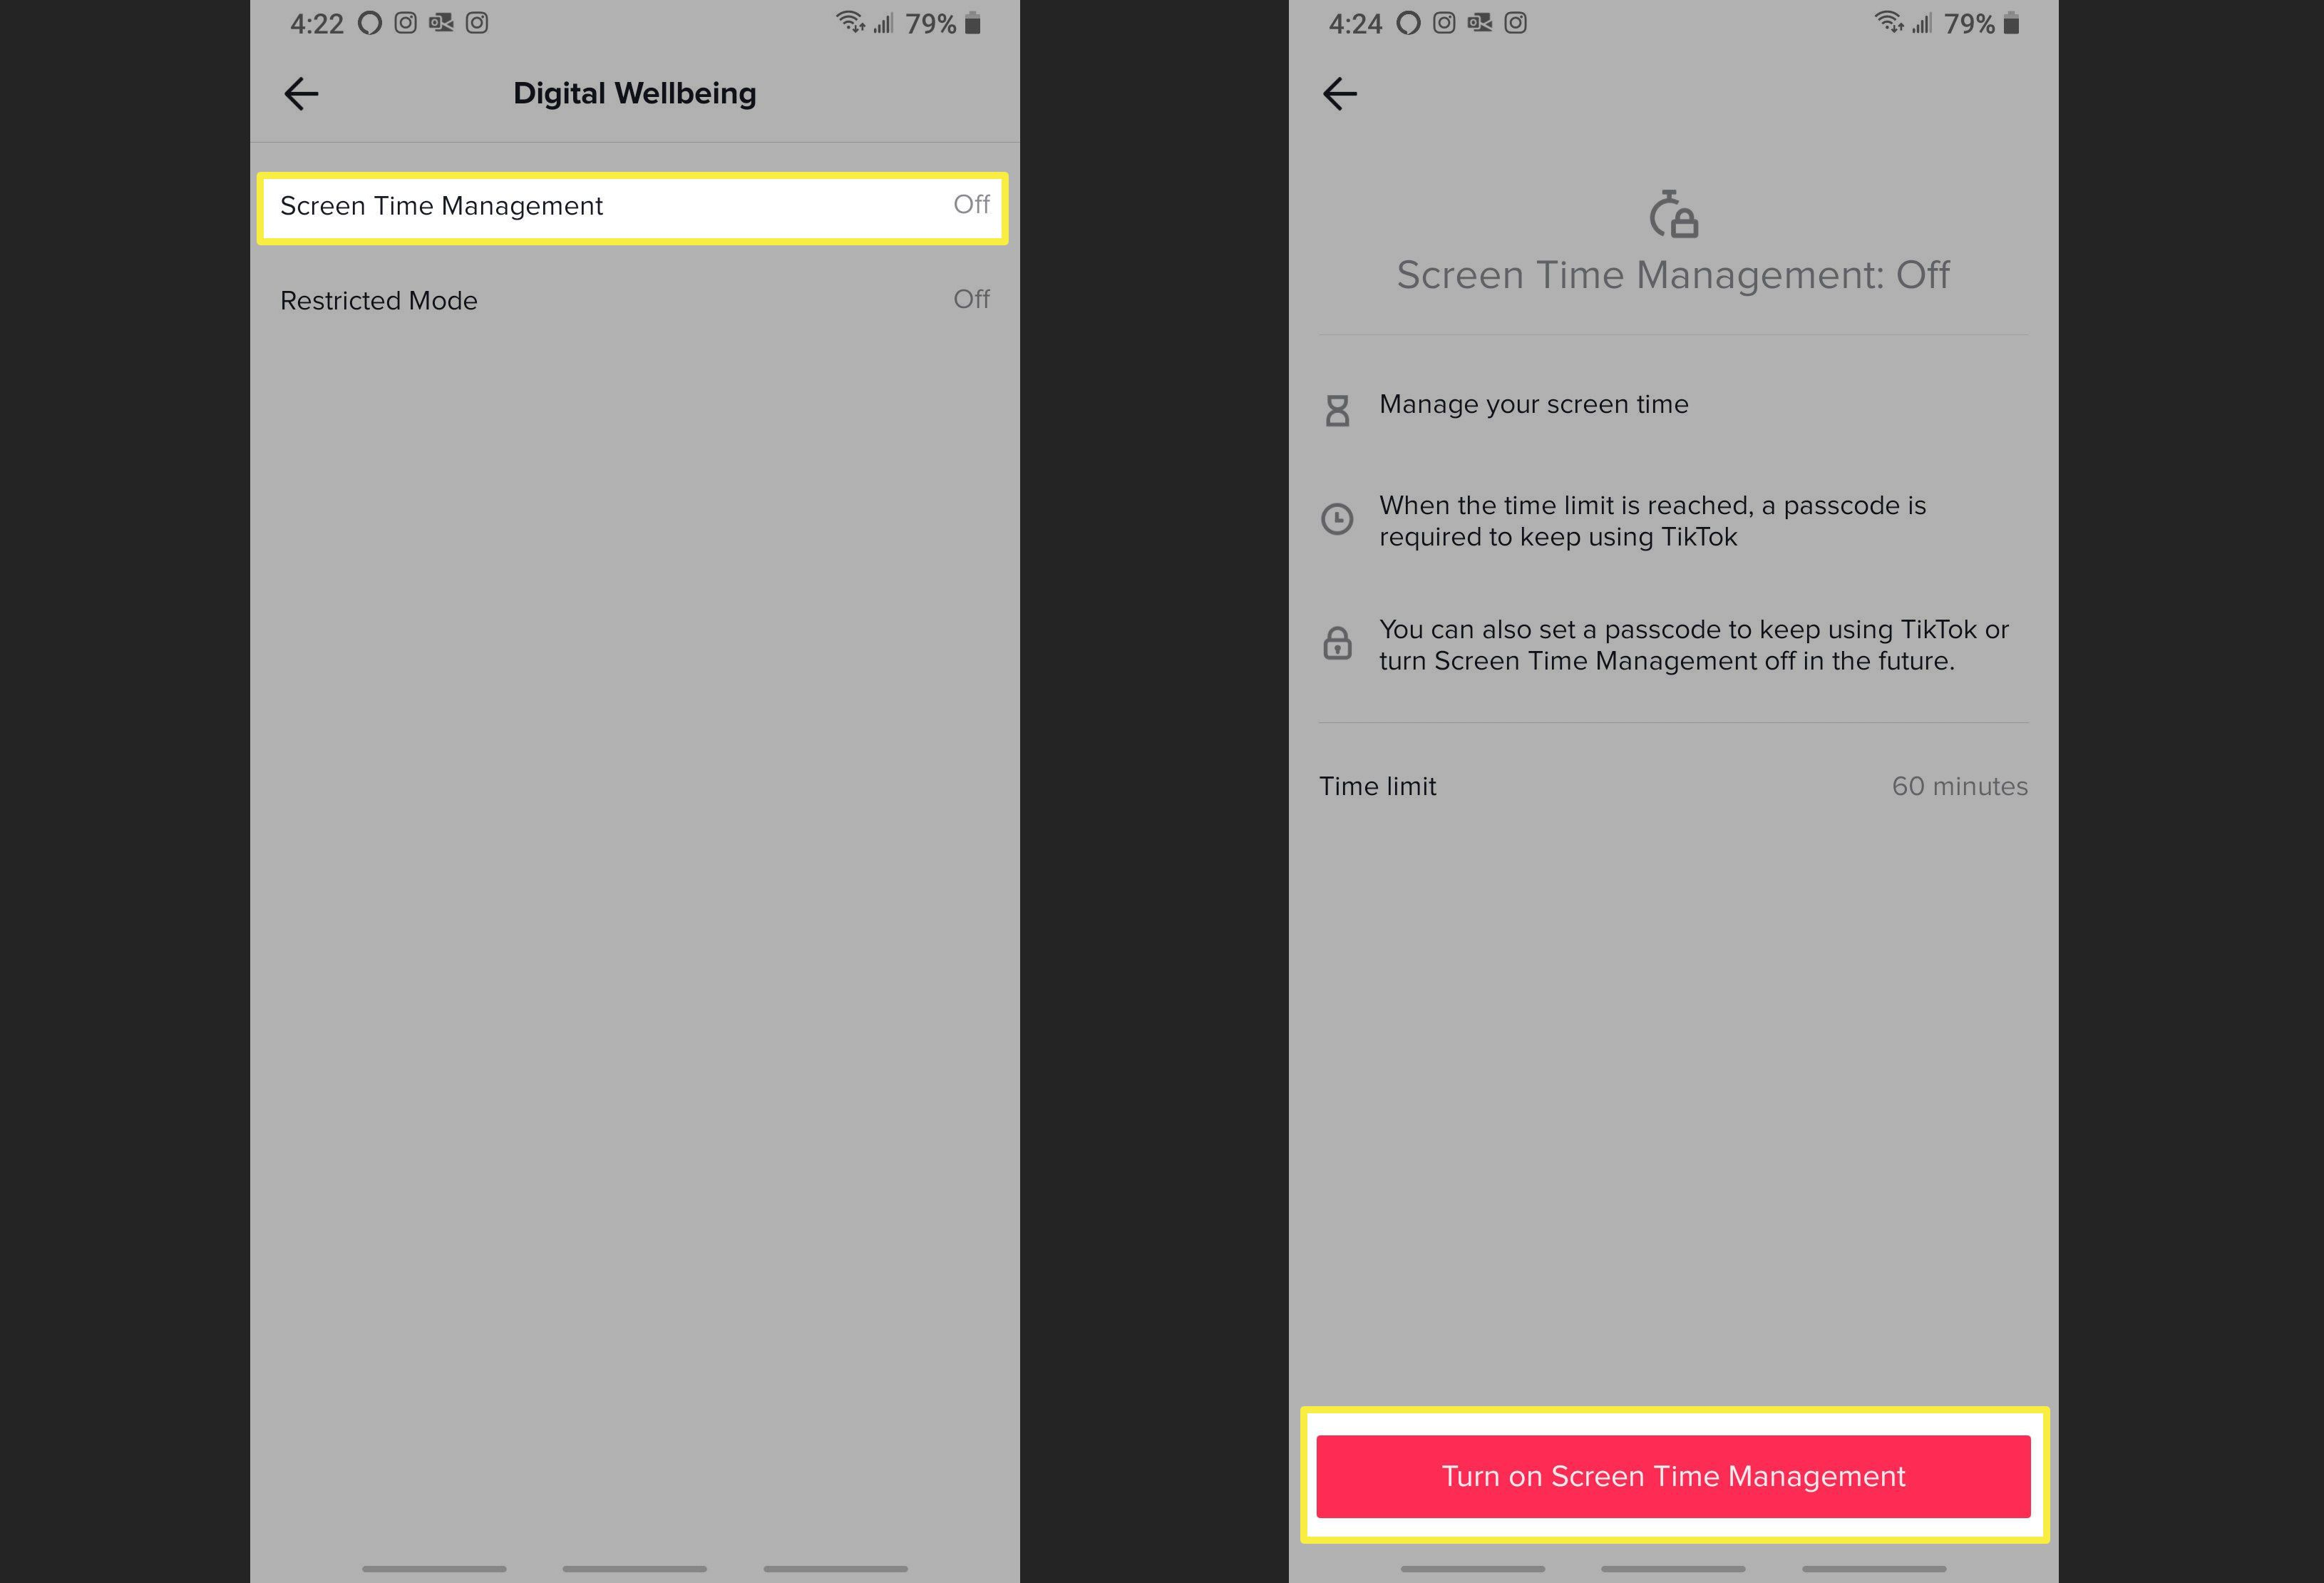 Turning on Screen Time Management on TikTok.